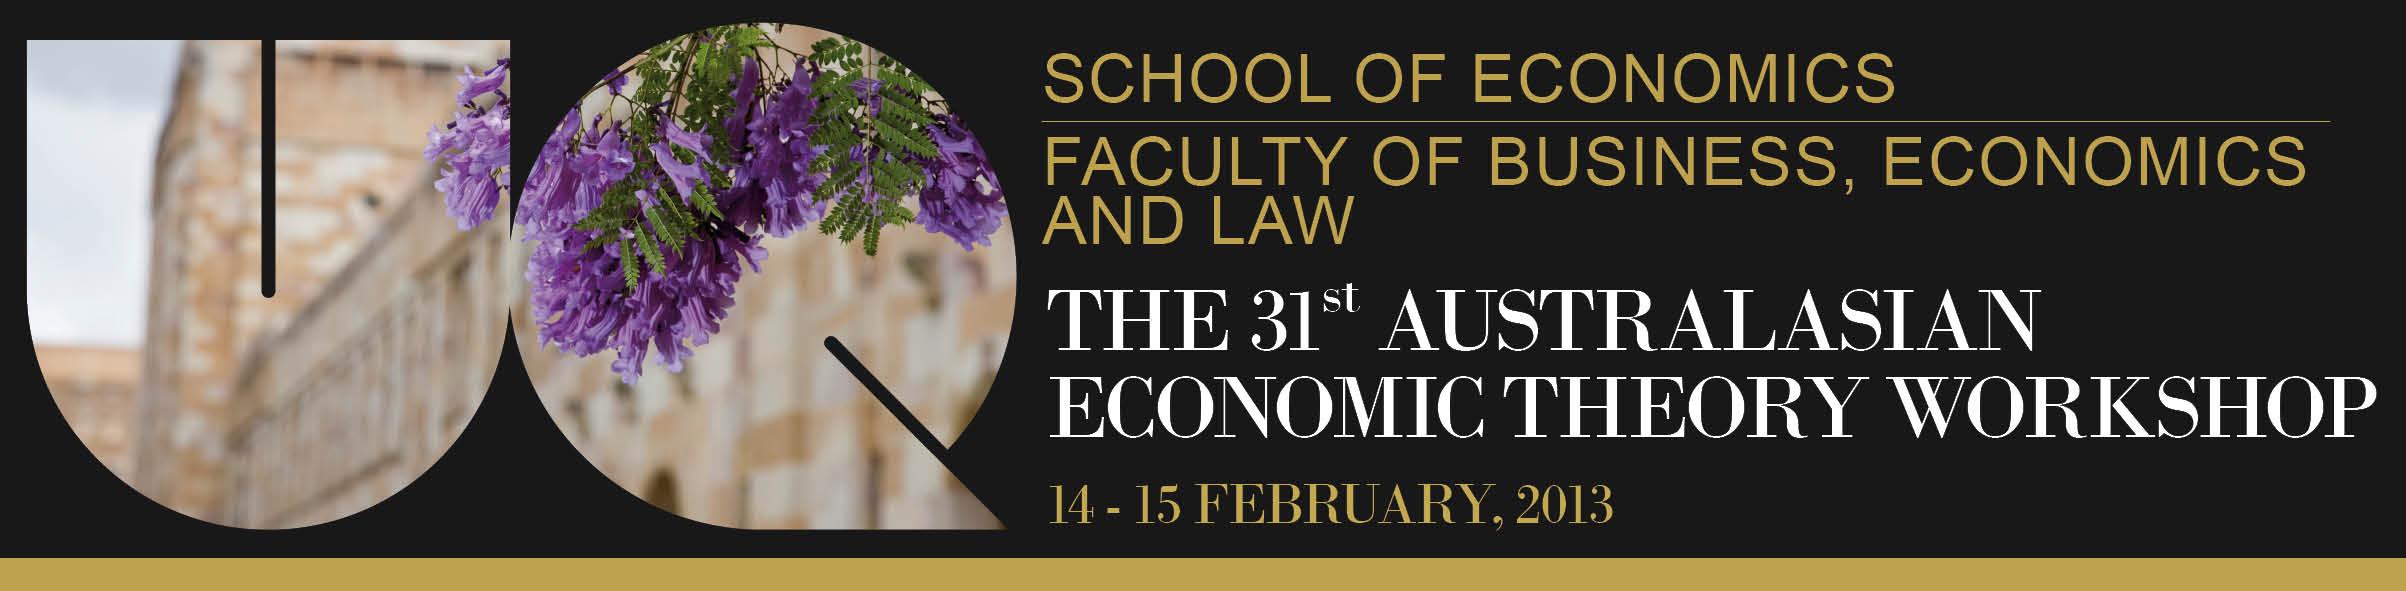 31st Australasian Economic Theory Workshop